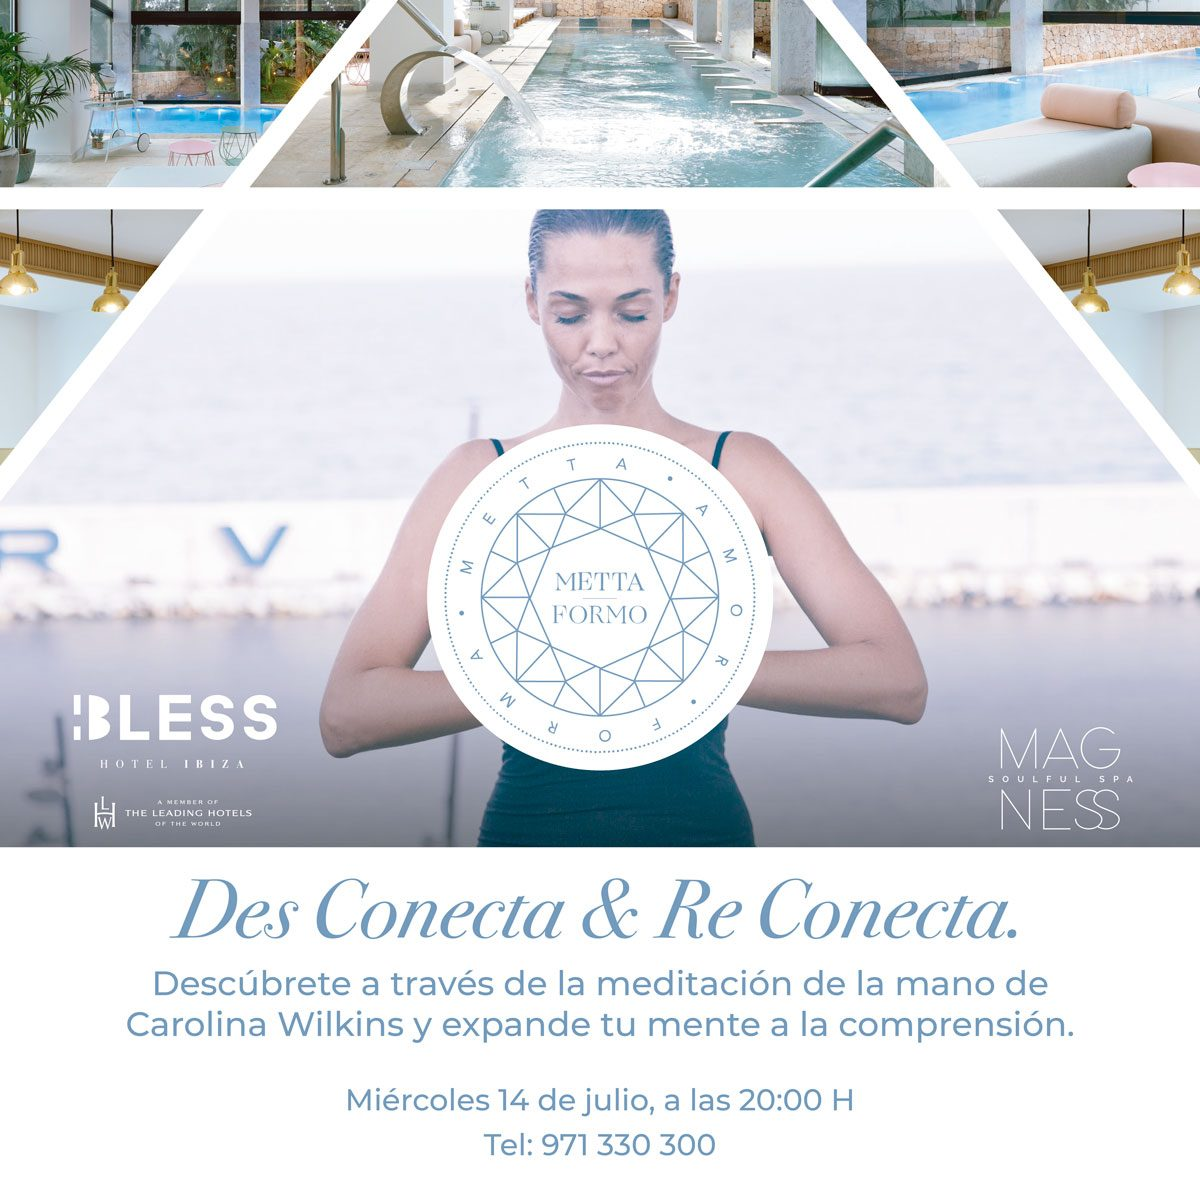 mettamorfo-carolina-wilkins-magness-soulful-spa-bless-hotel-ibiza-2021-welcometoibiza